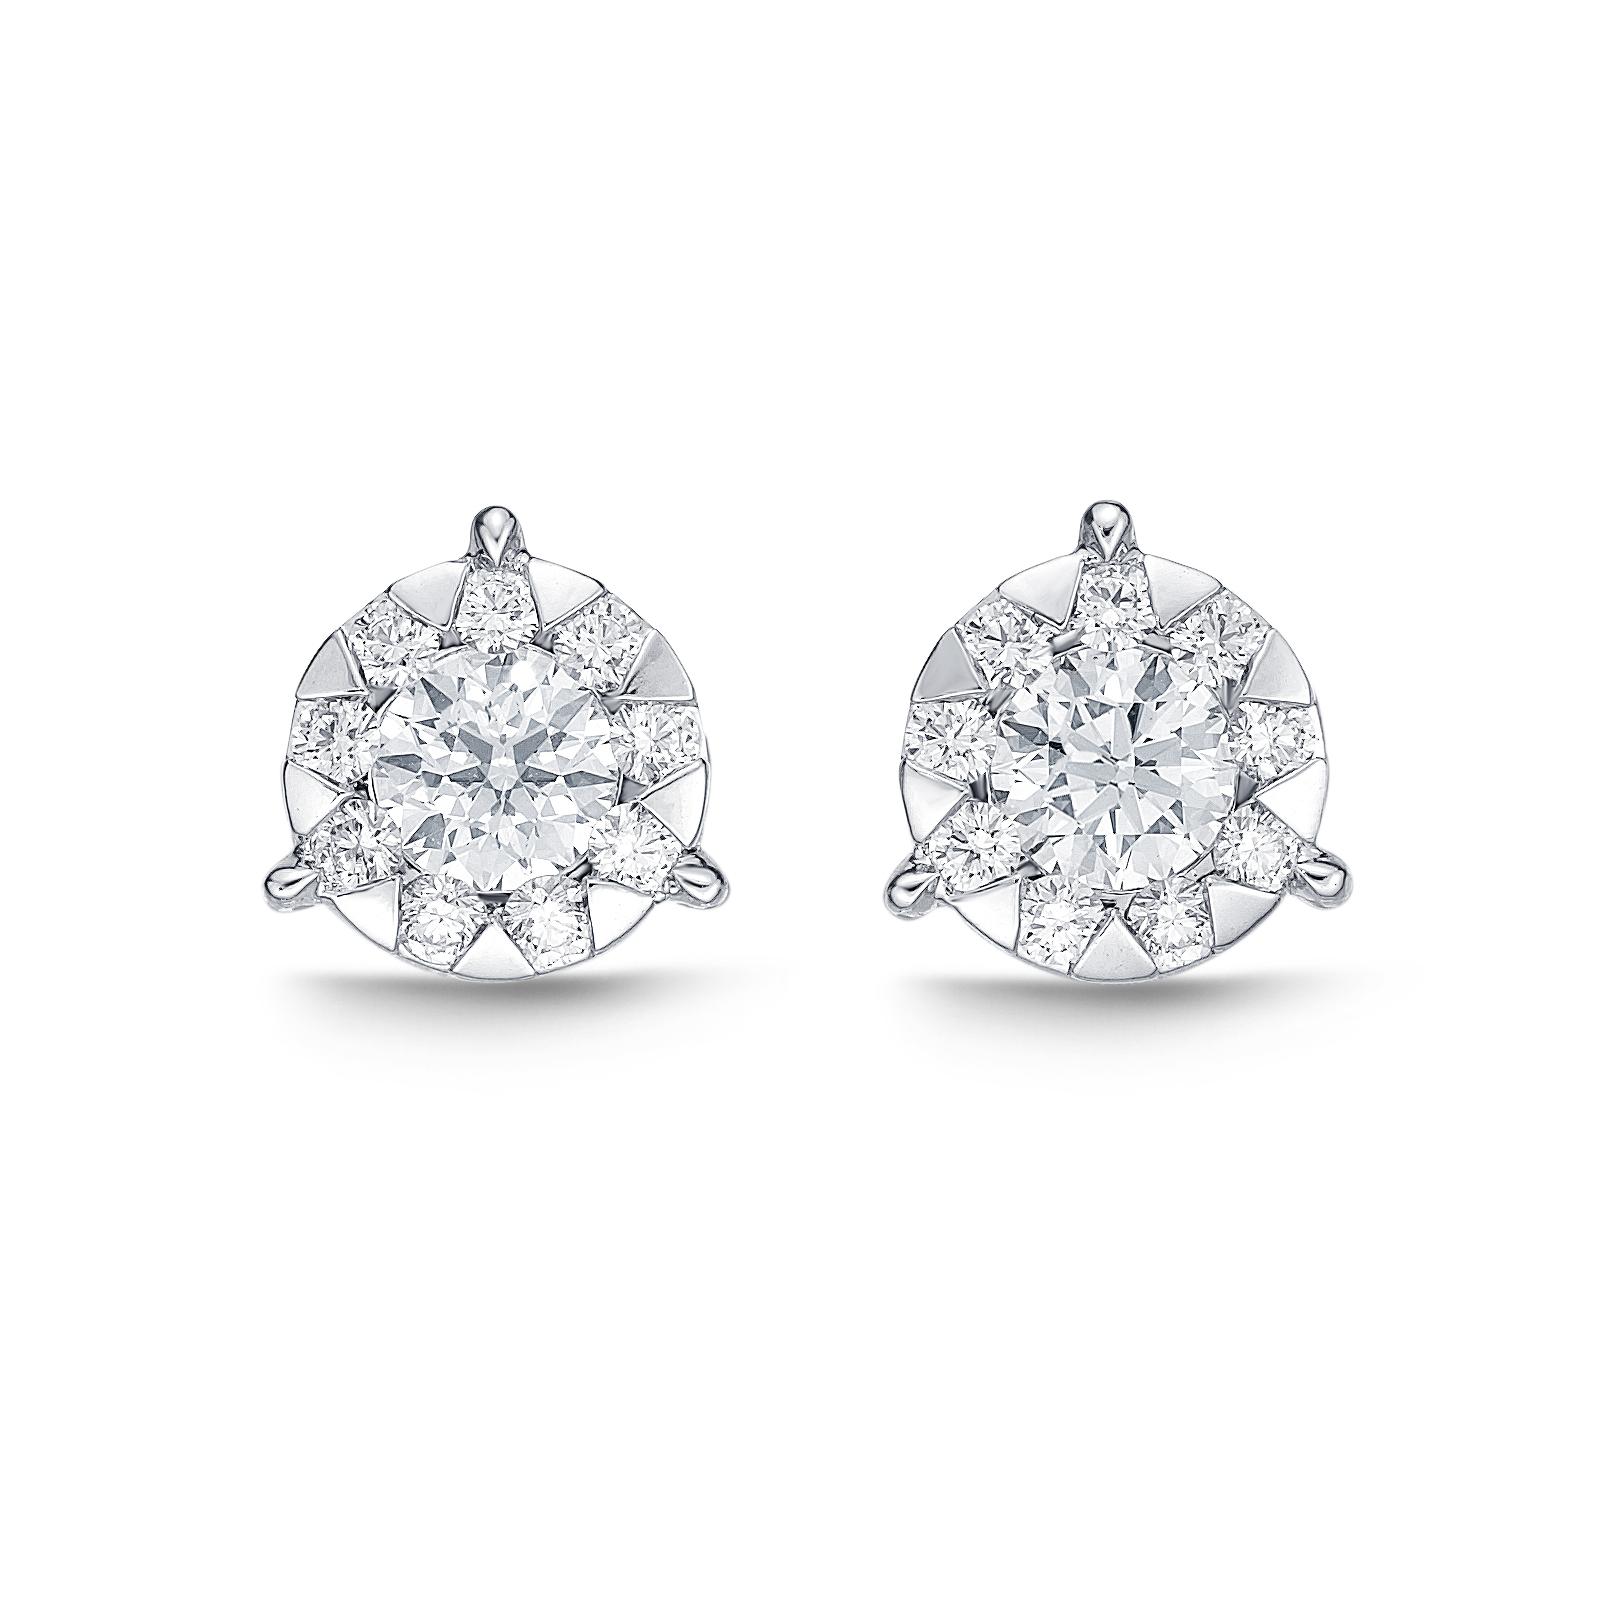 Memoire 18ct White Gold 0.15 Carat Diamond 3 Prong Bouquet Style Stud Earrings